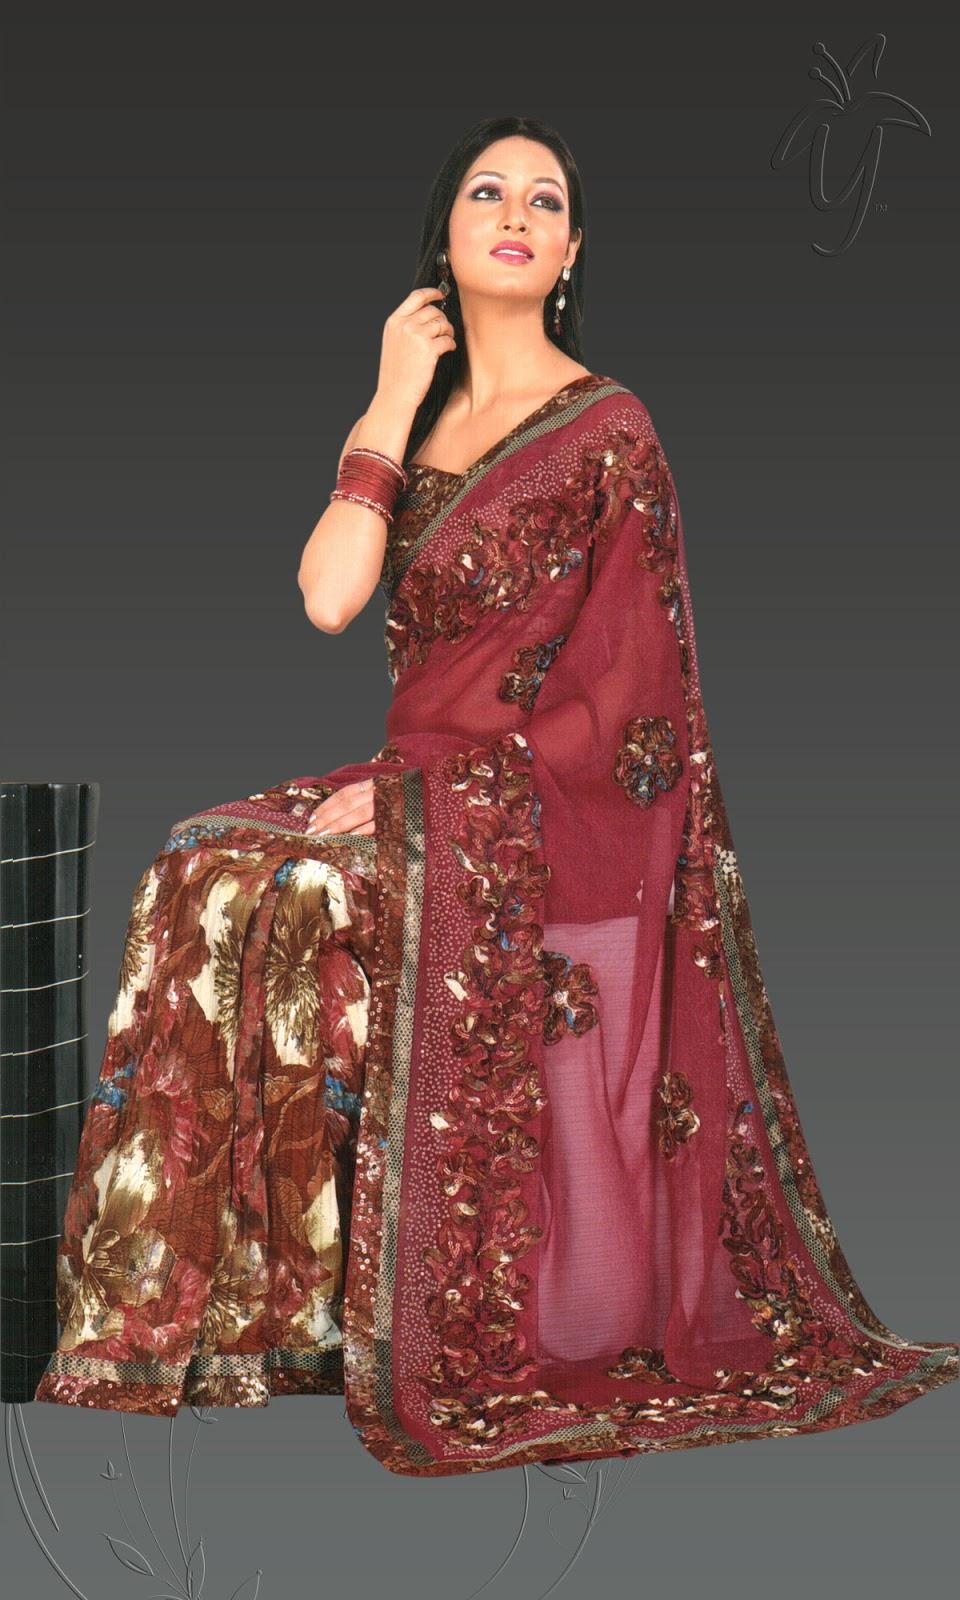 Duji nanda fashion designer Careers Treasure Design Studio Embellished Talk